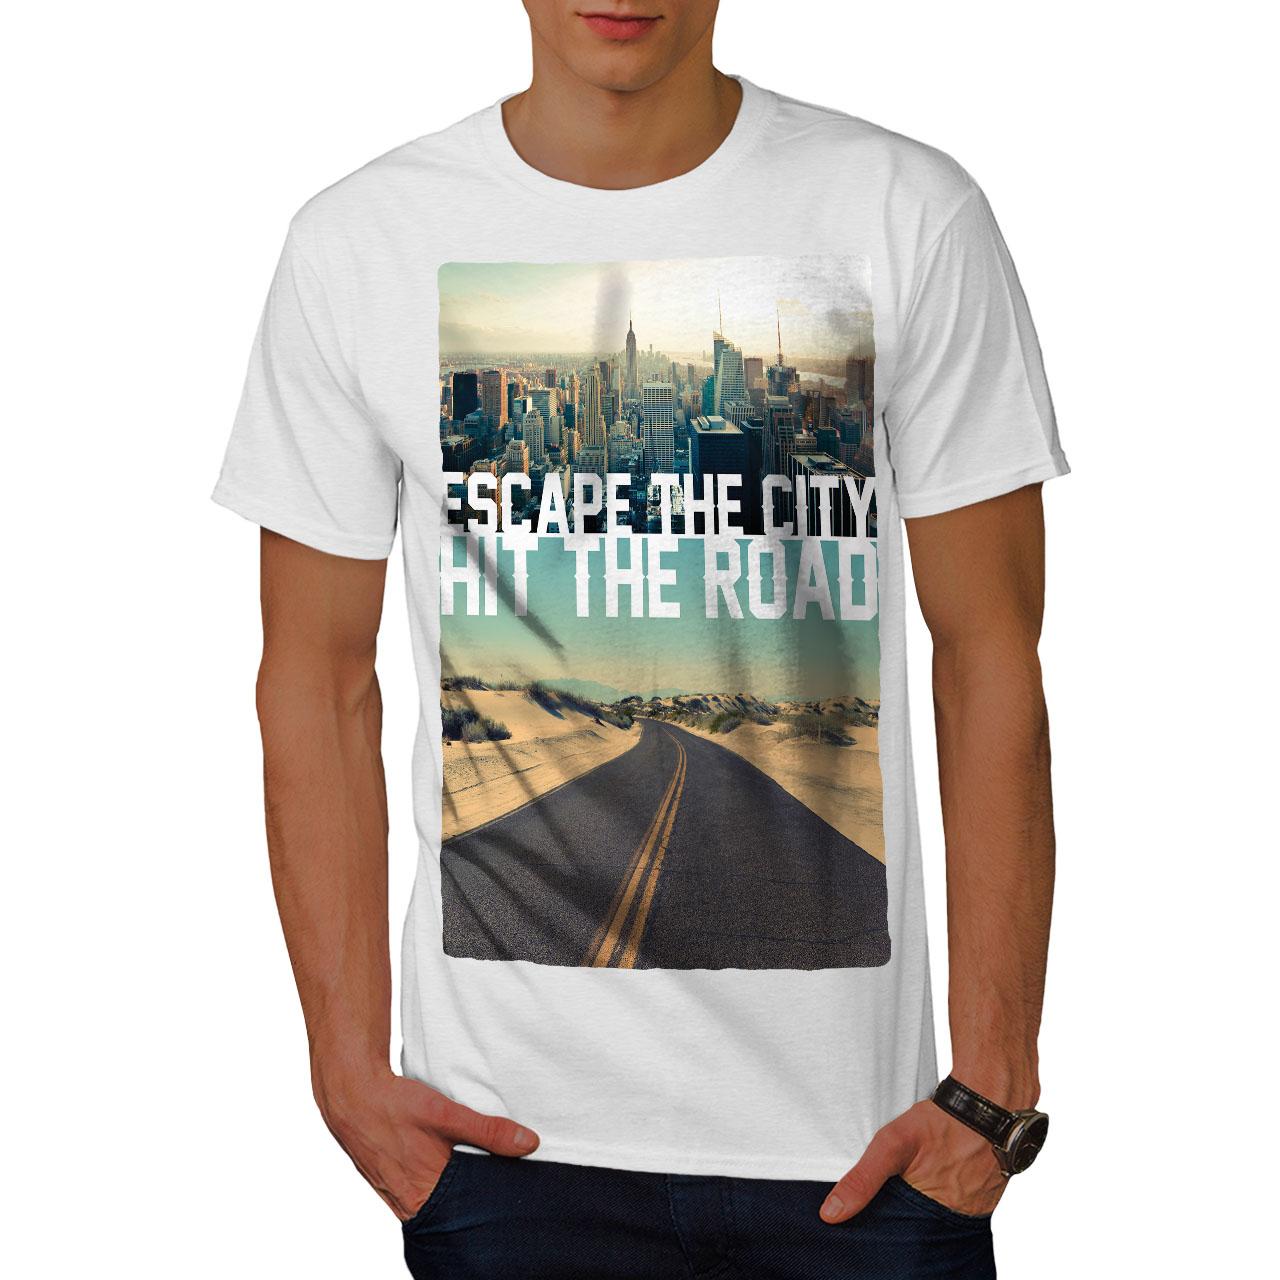 Wellcoda-Escape-The-City-Herren-T-Shirt-Lifestyle-Grafikdesign-Printed-Tee Indexbild 9